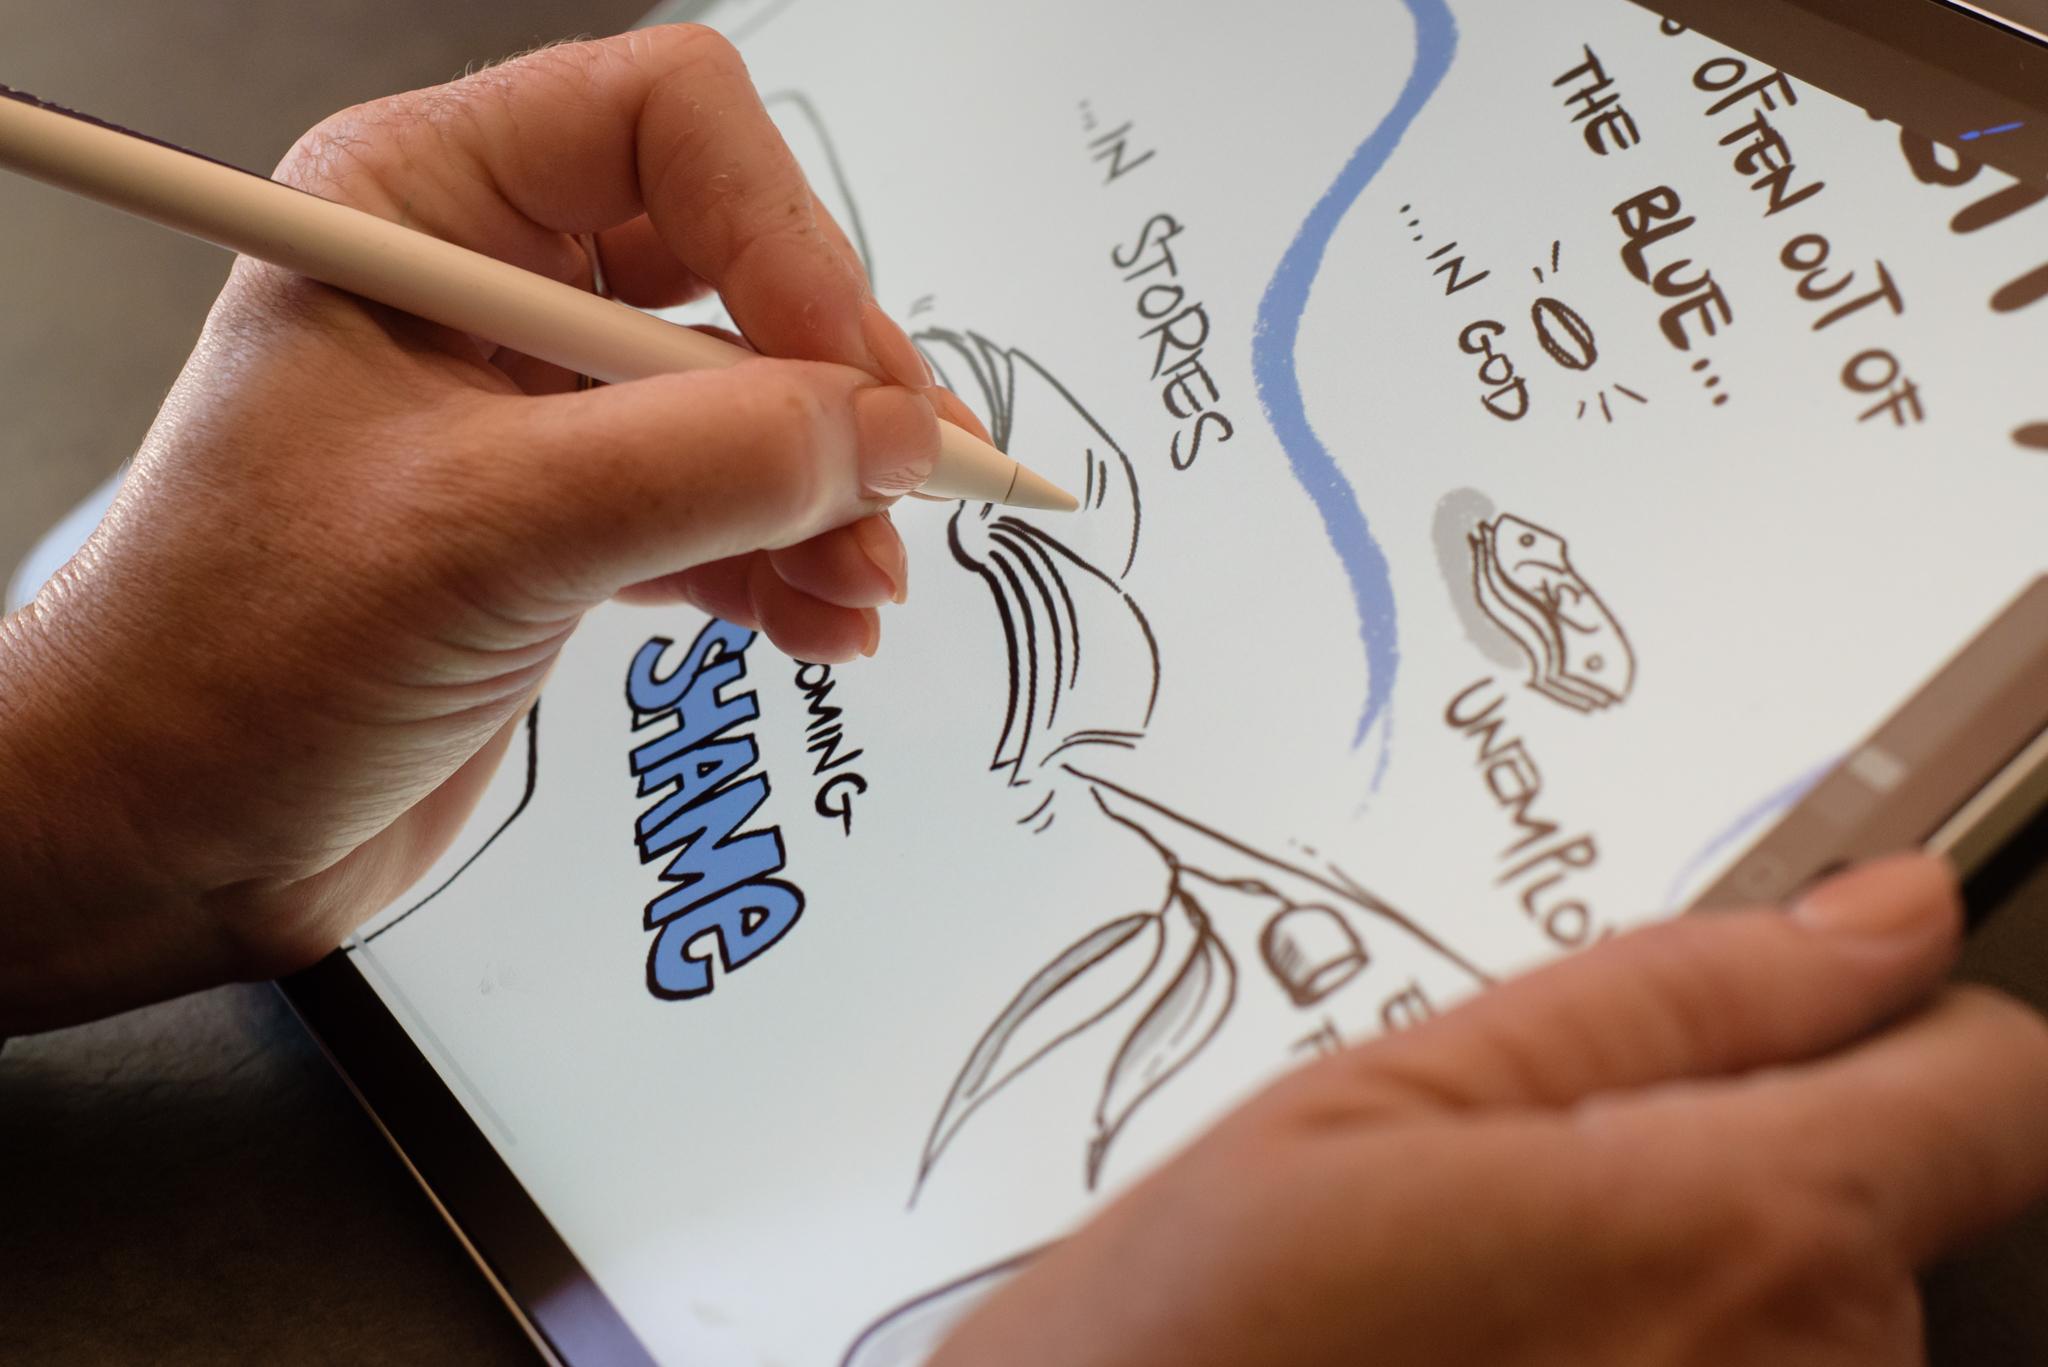 Graphic Recording digitally on iPad Pro